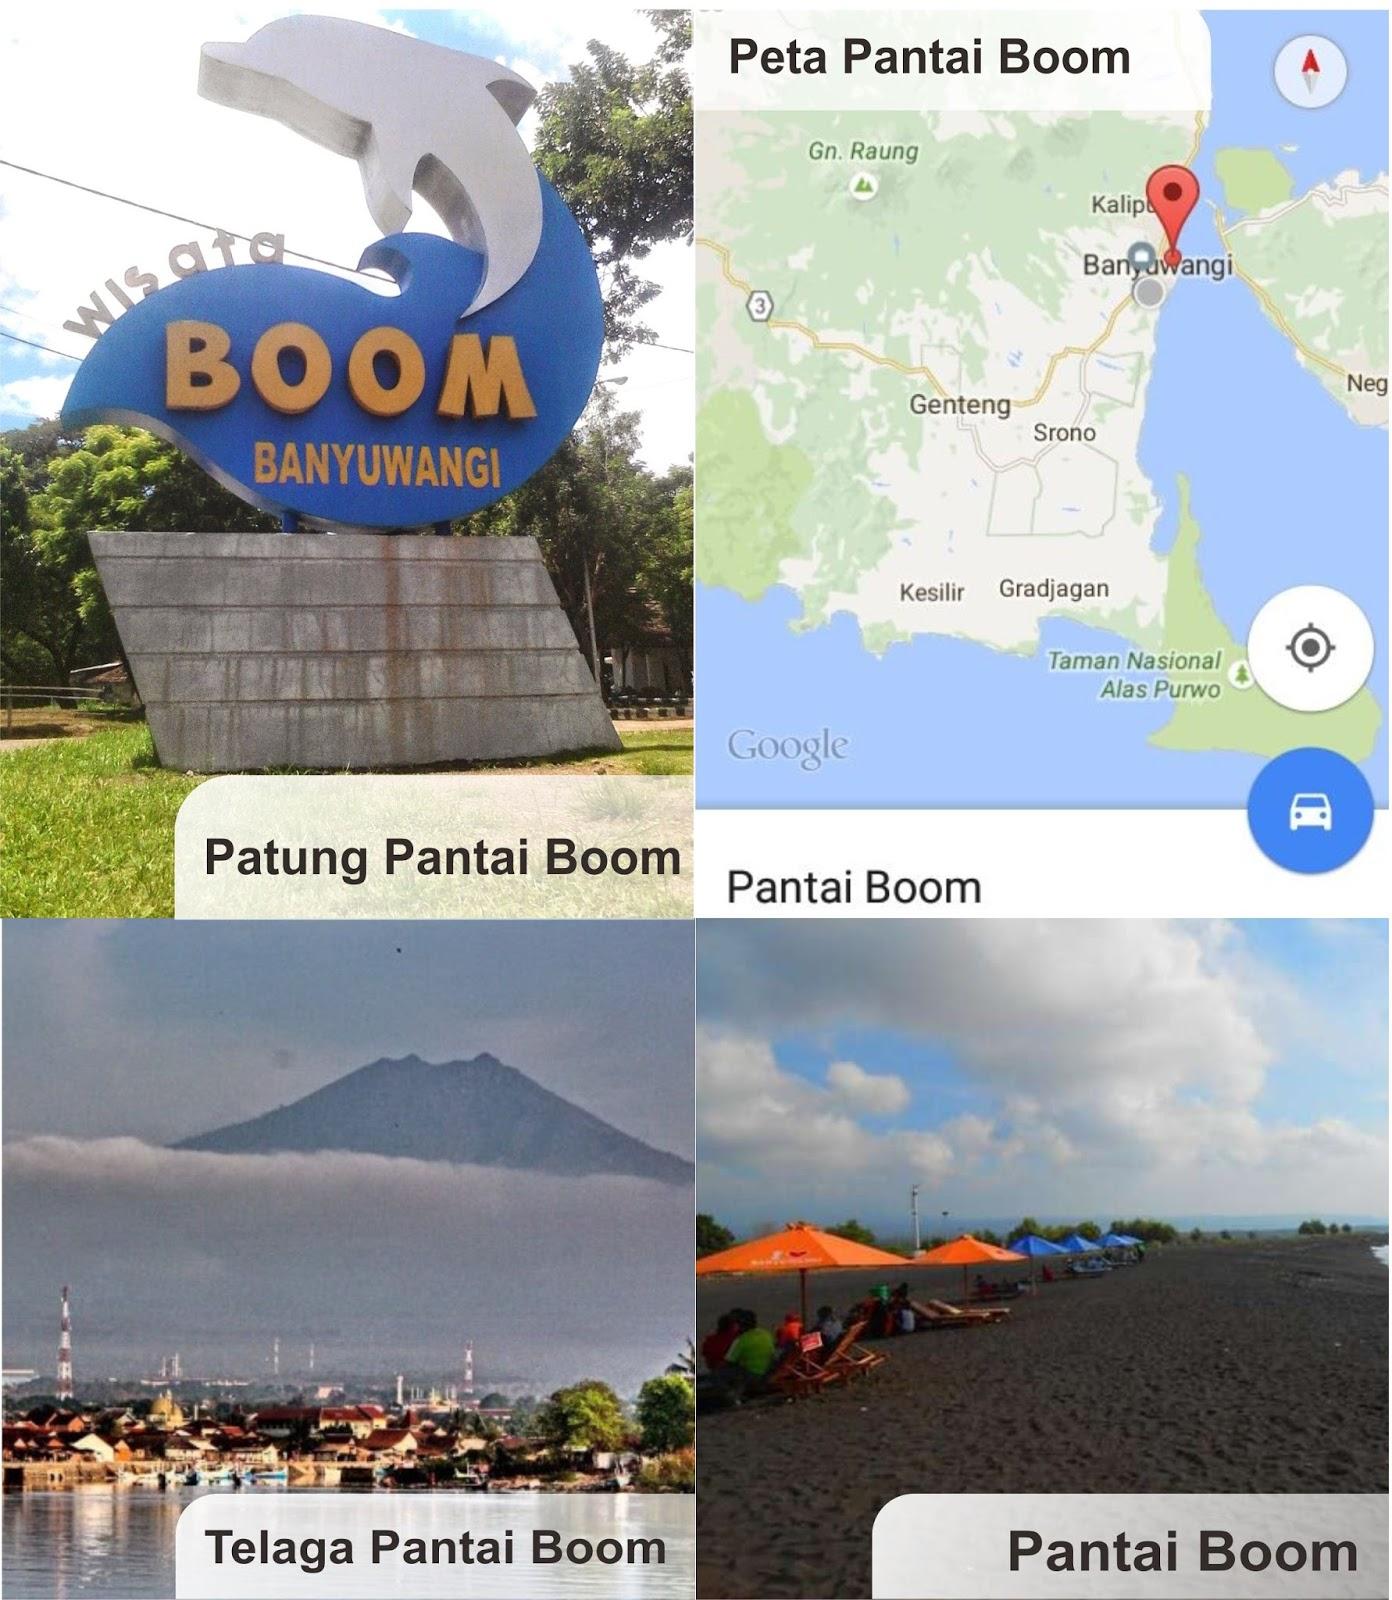 Coretan Kita Bersama Nama Pantai Kabupaten Banyuwangi Pembuatan Kapal Umbul